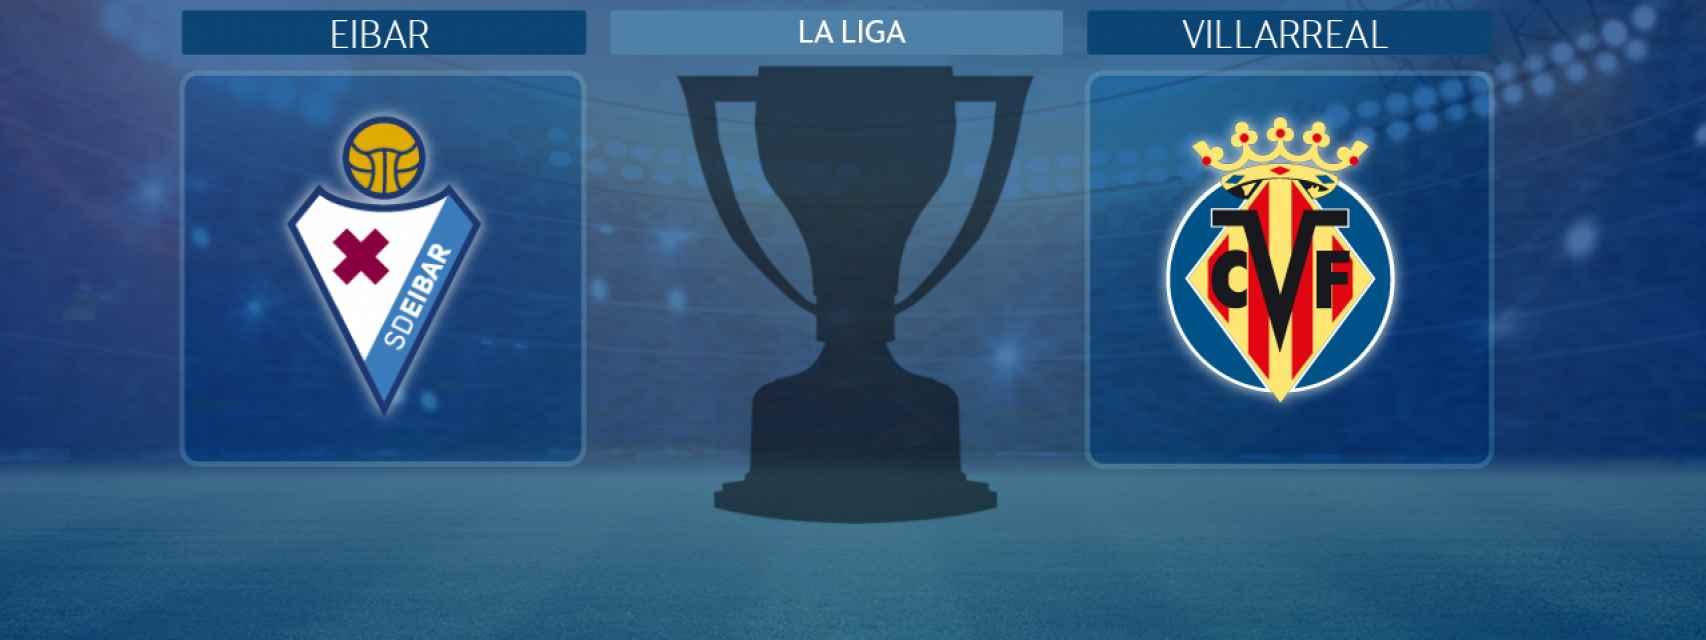 Eibar - Villarreal, partido de La Liga